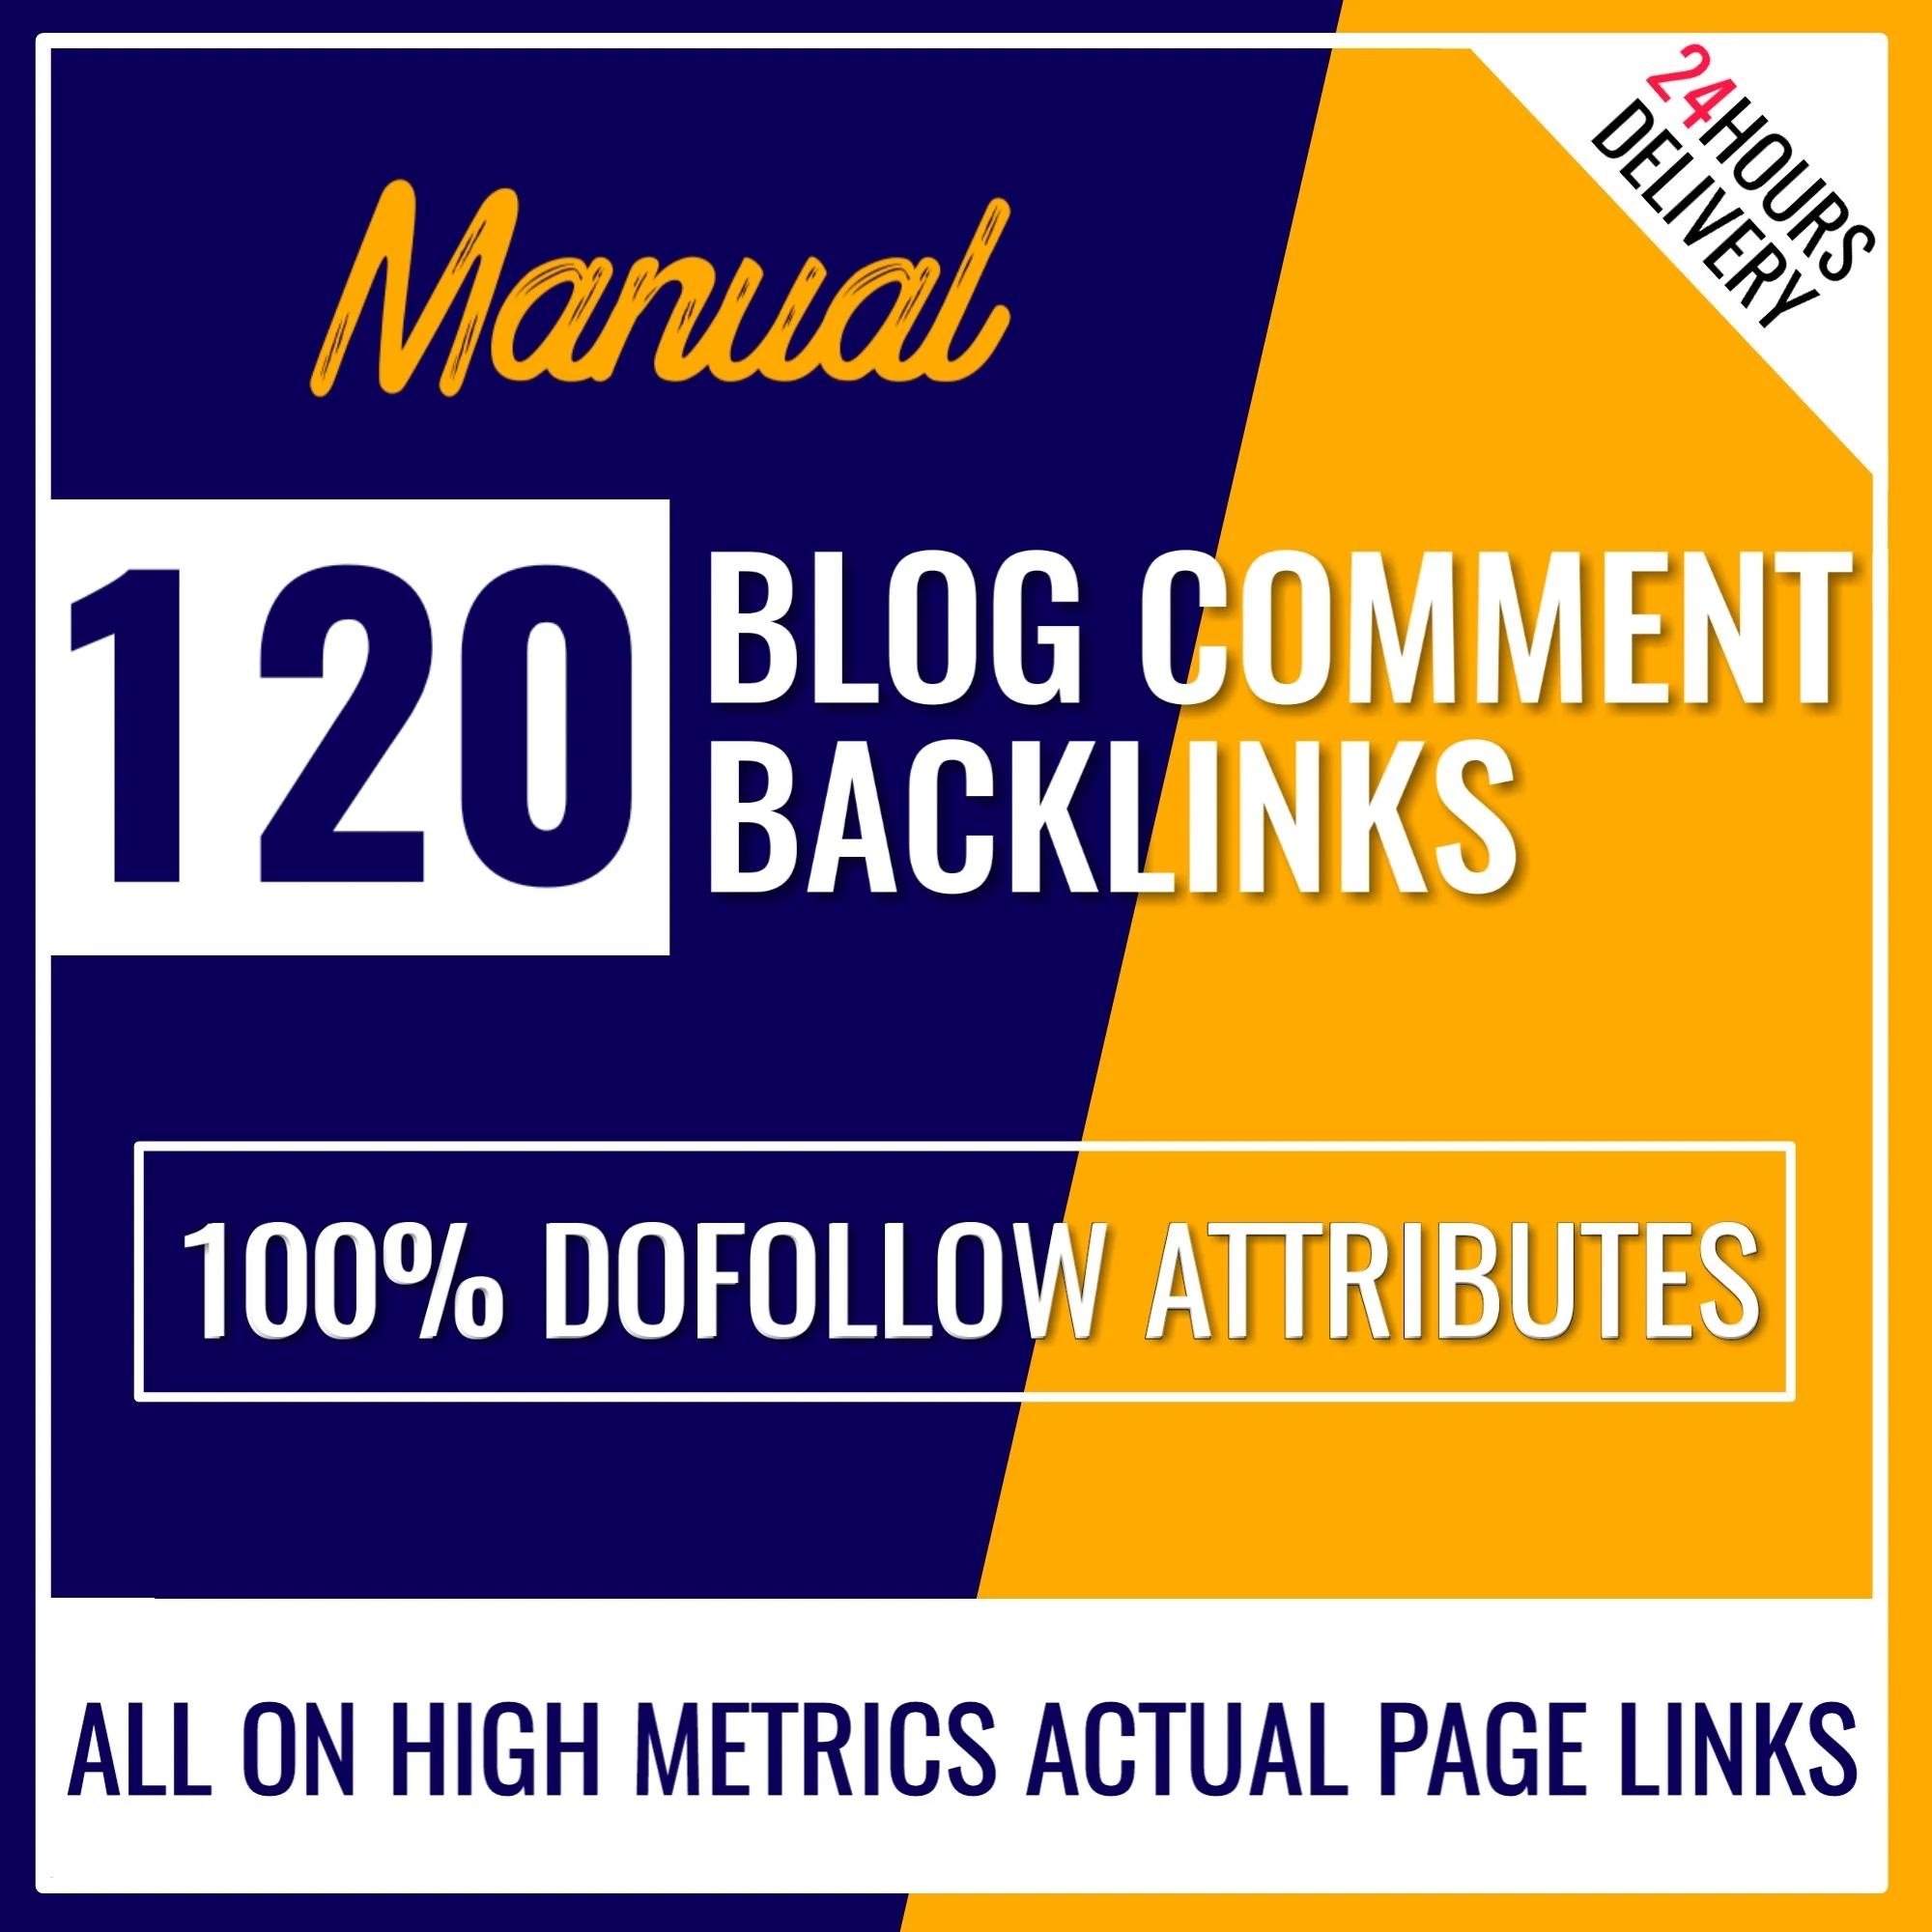 I will build 120 dofollow blog comment backlinks manually